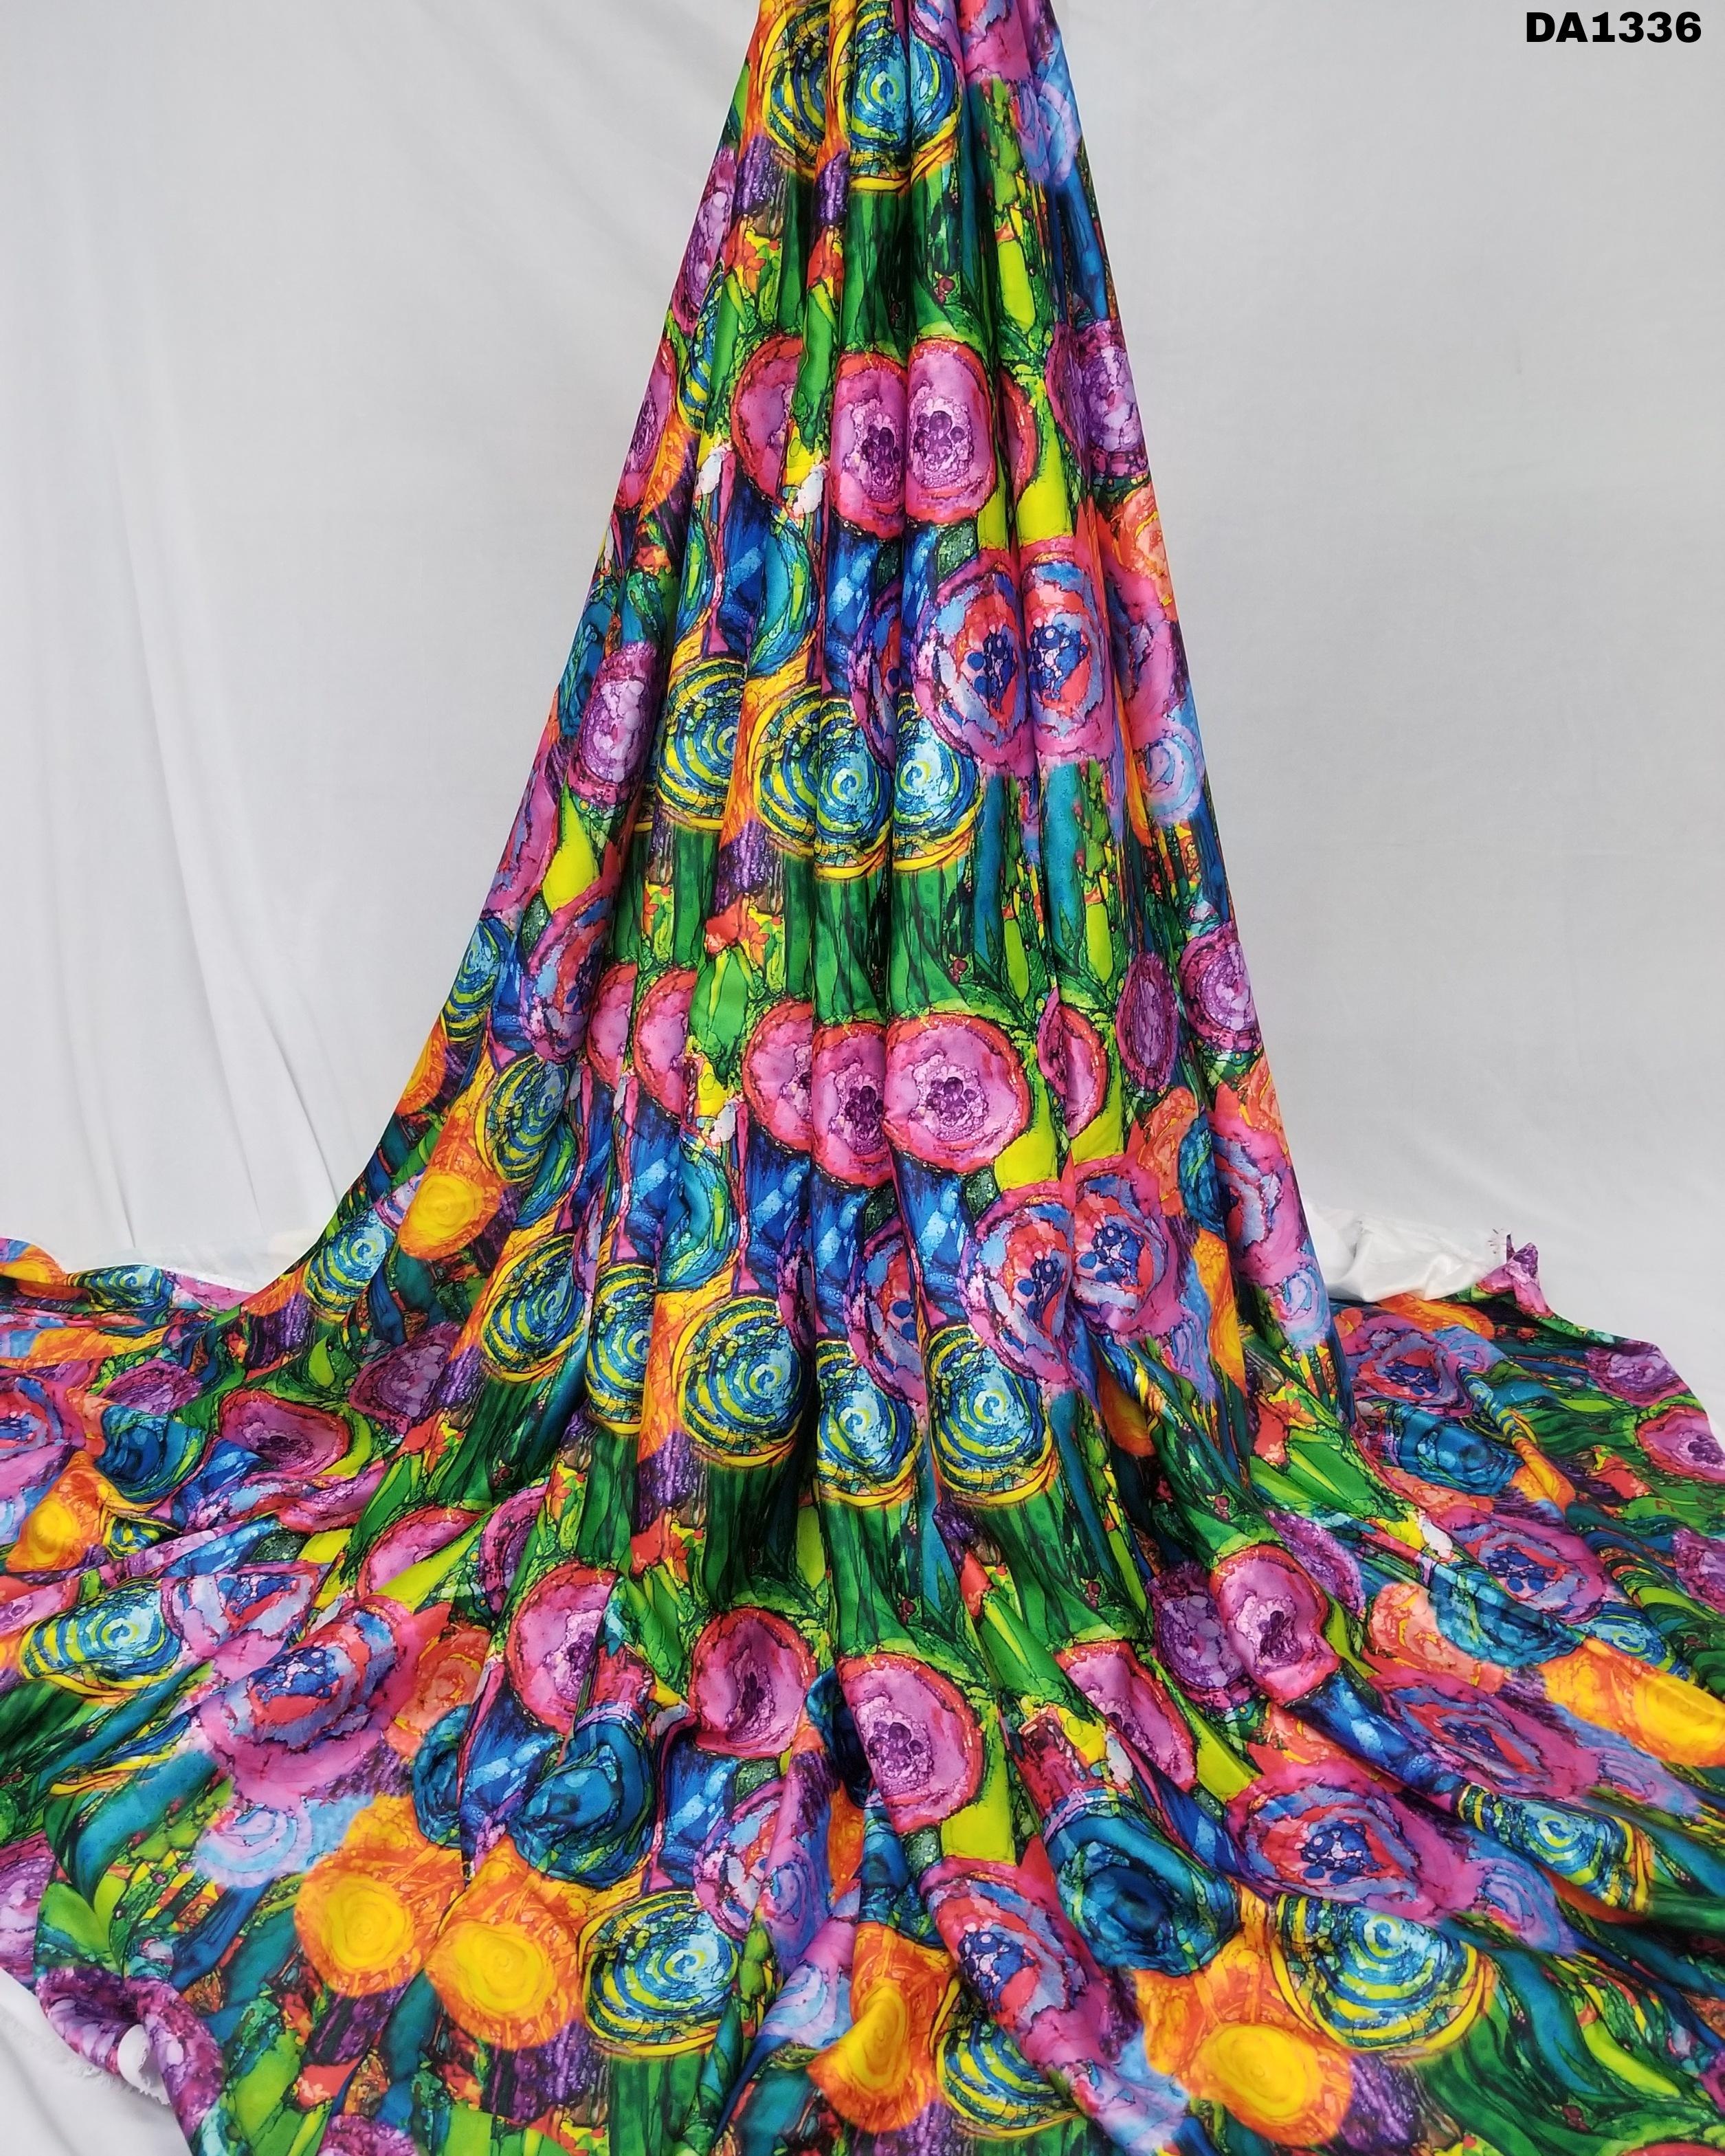 Baby Sartin Silk Digital Print Fabric